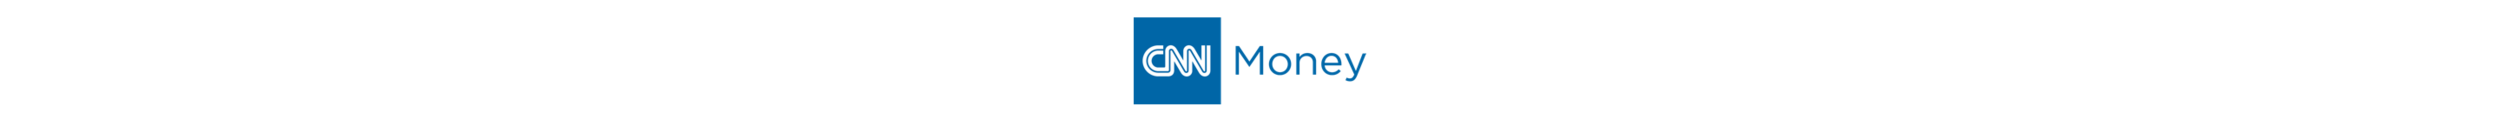 money logo banner.png